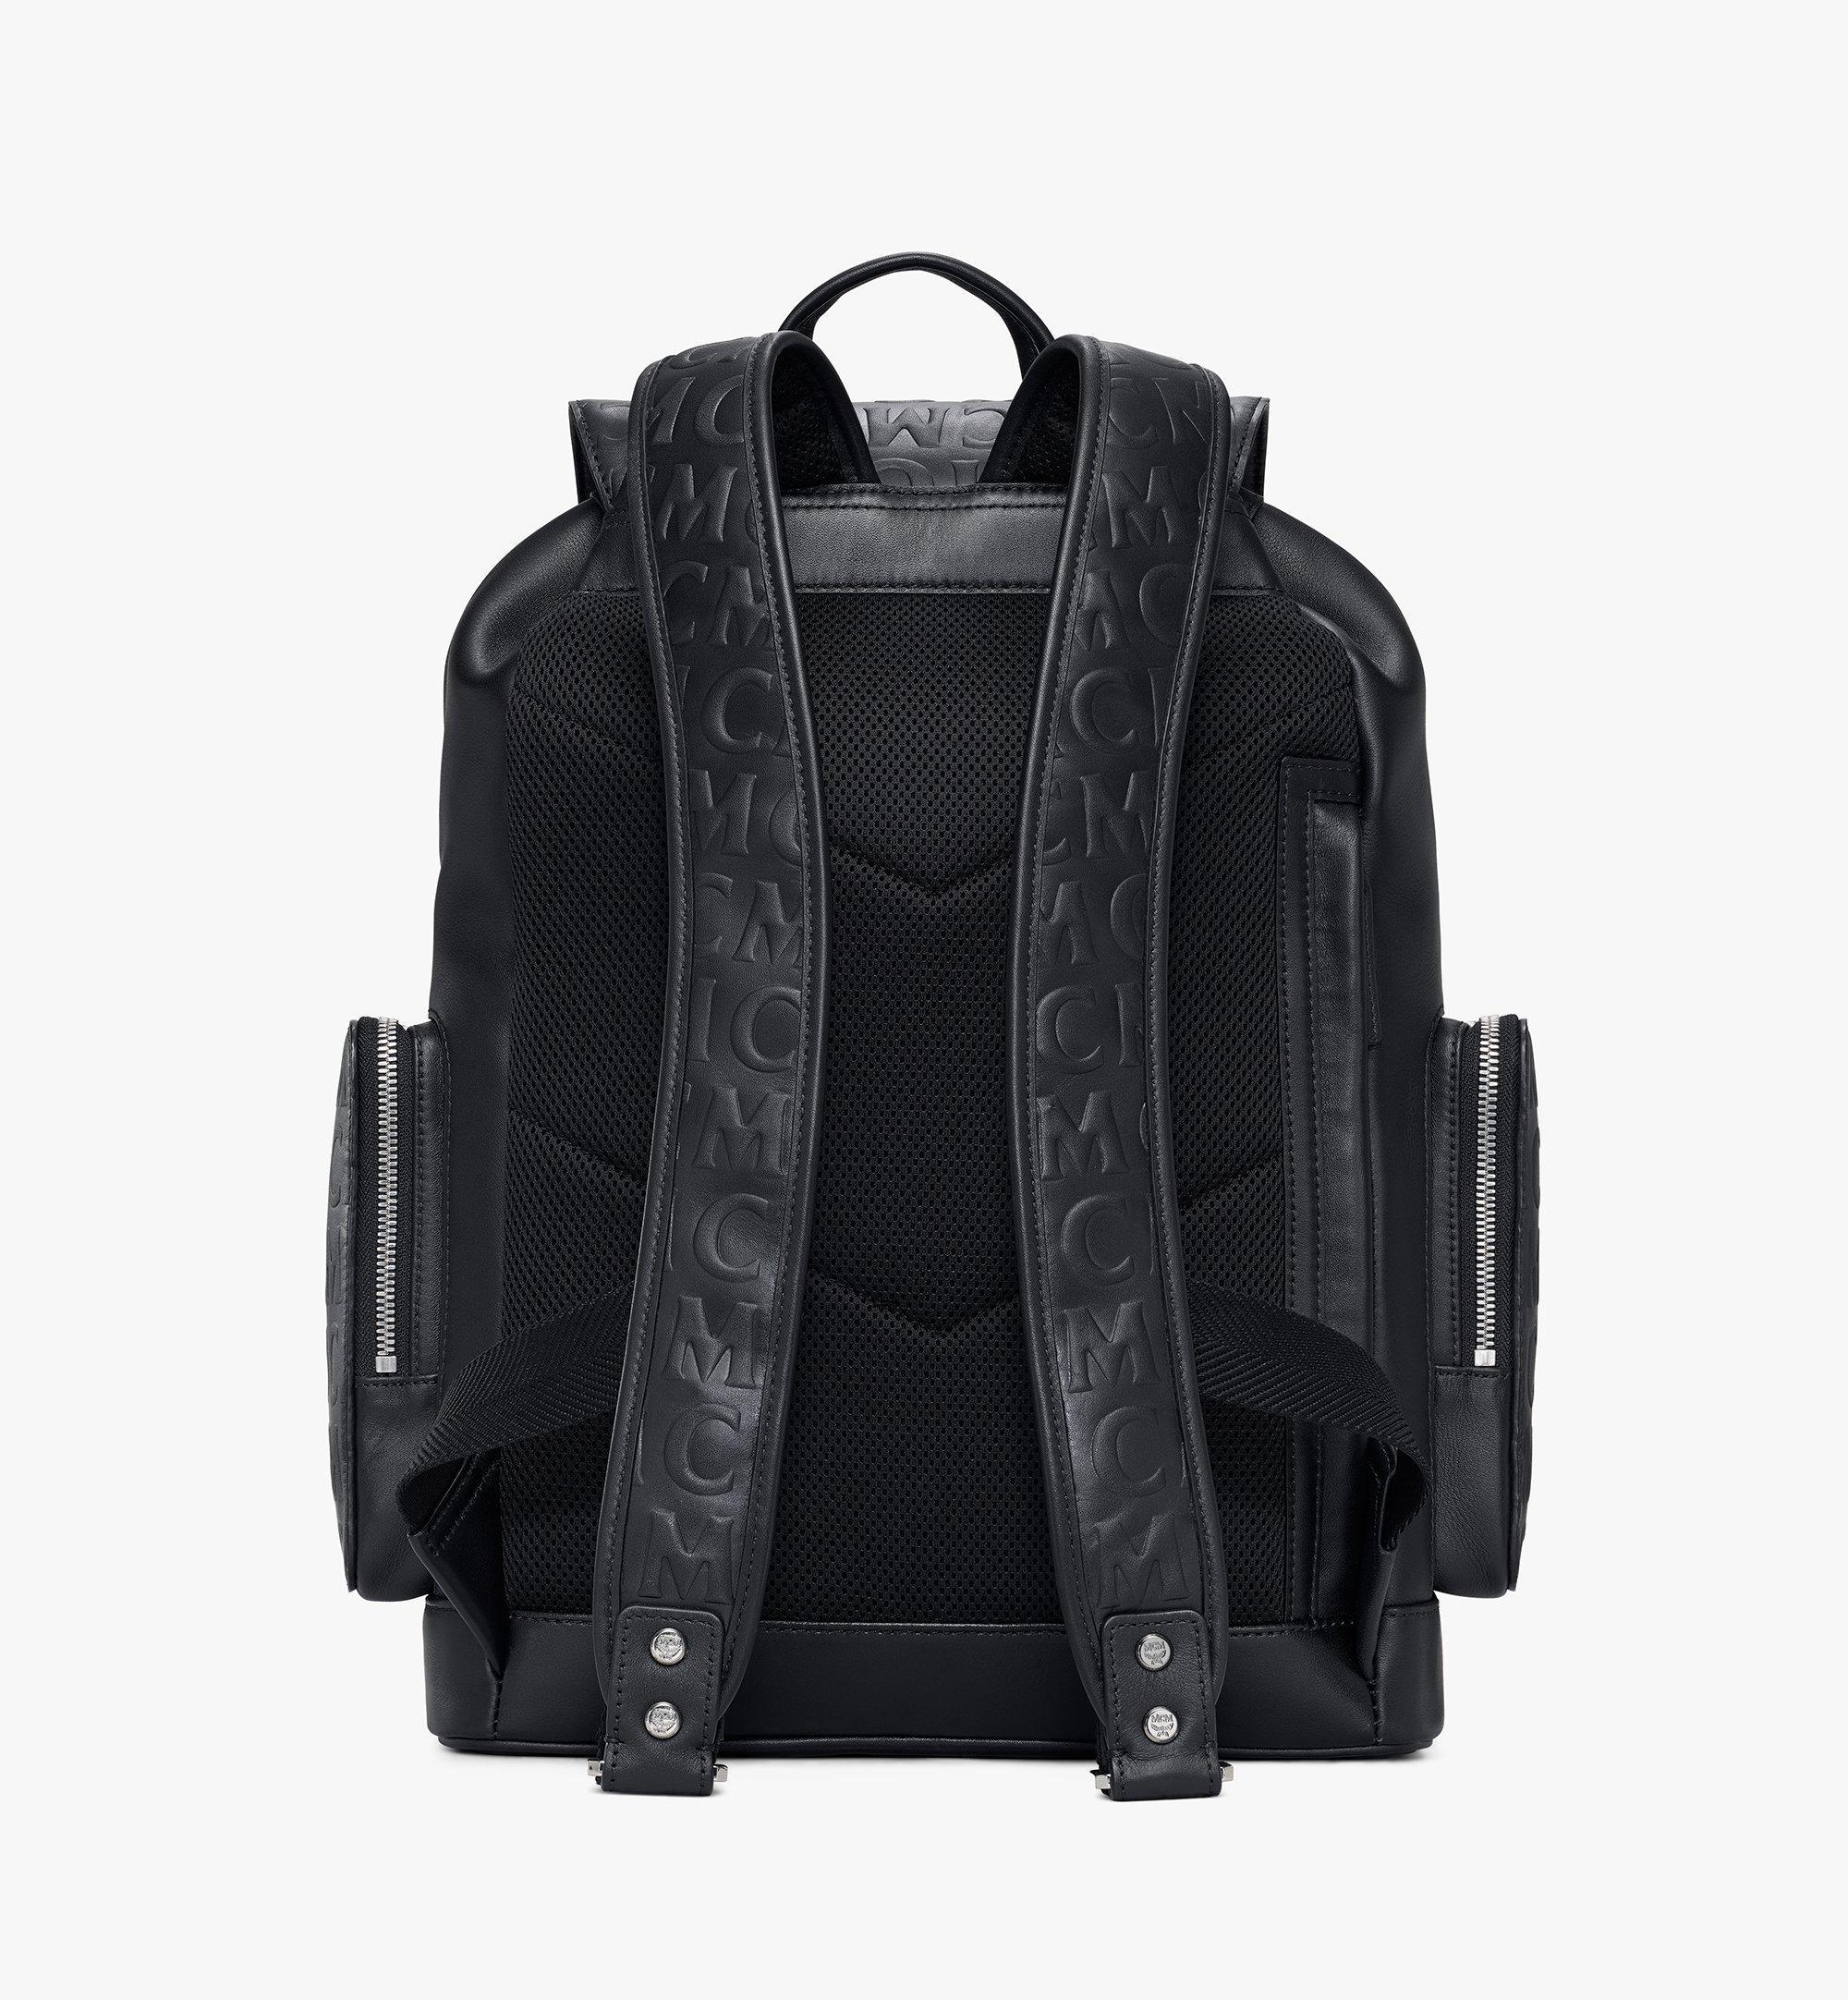 MCM Brandenburg Backpack in MCM Monogram Leather Black MMKAABG06BK001 Alternate View 3